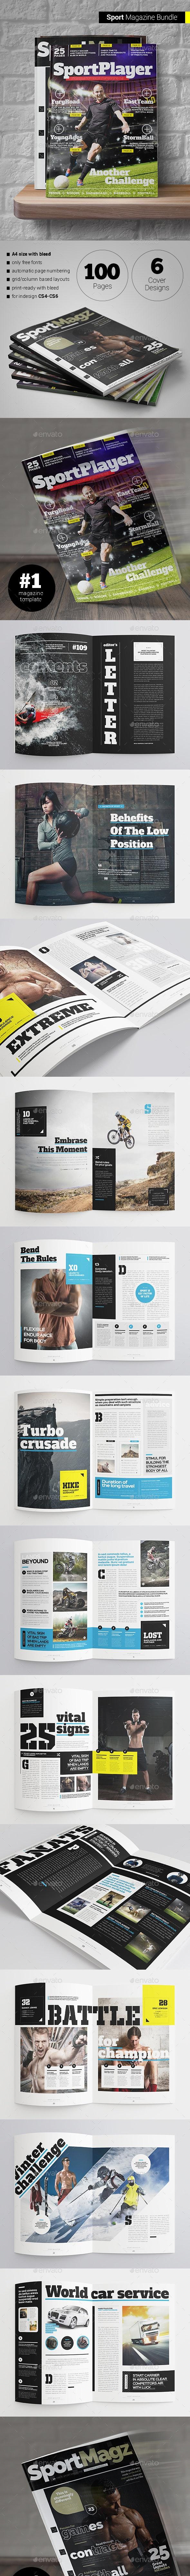 Sport Magazine Bundle (4 in 1) - Magazines Print Templates